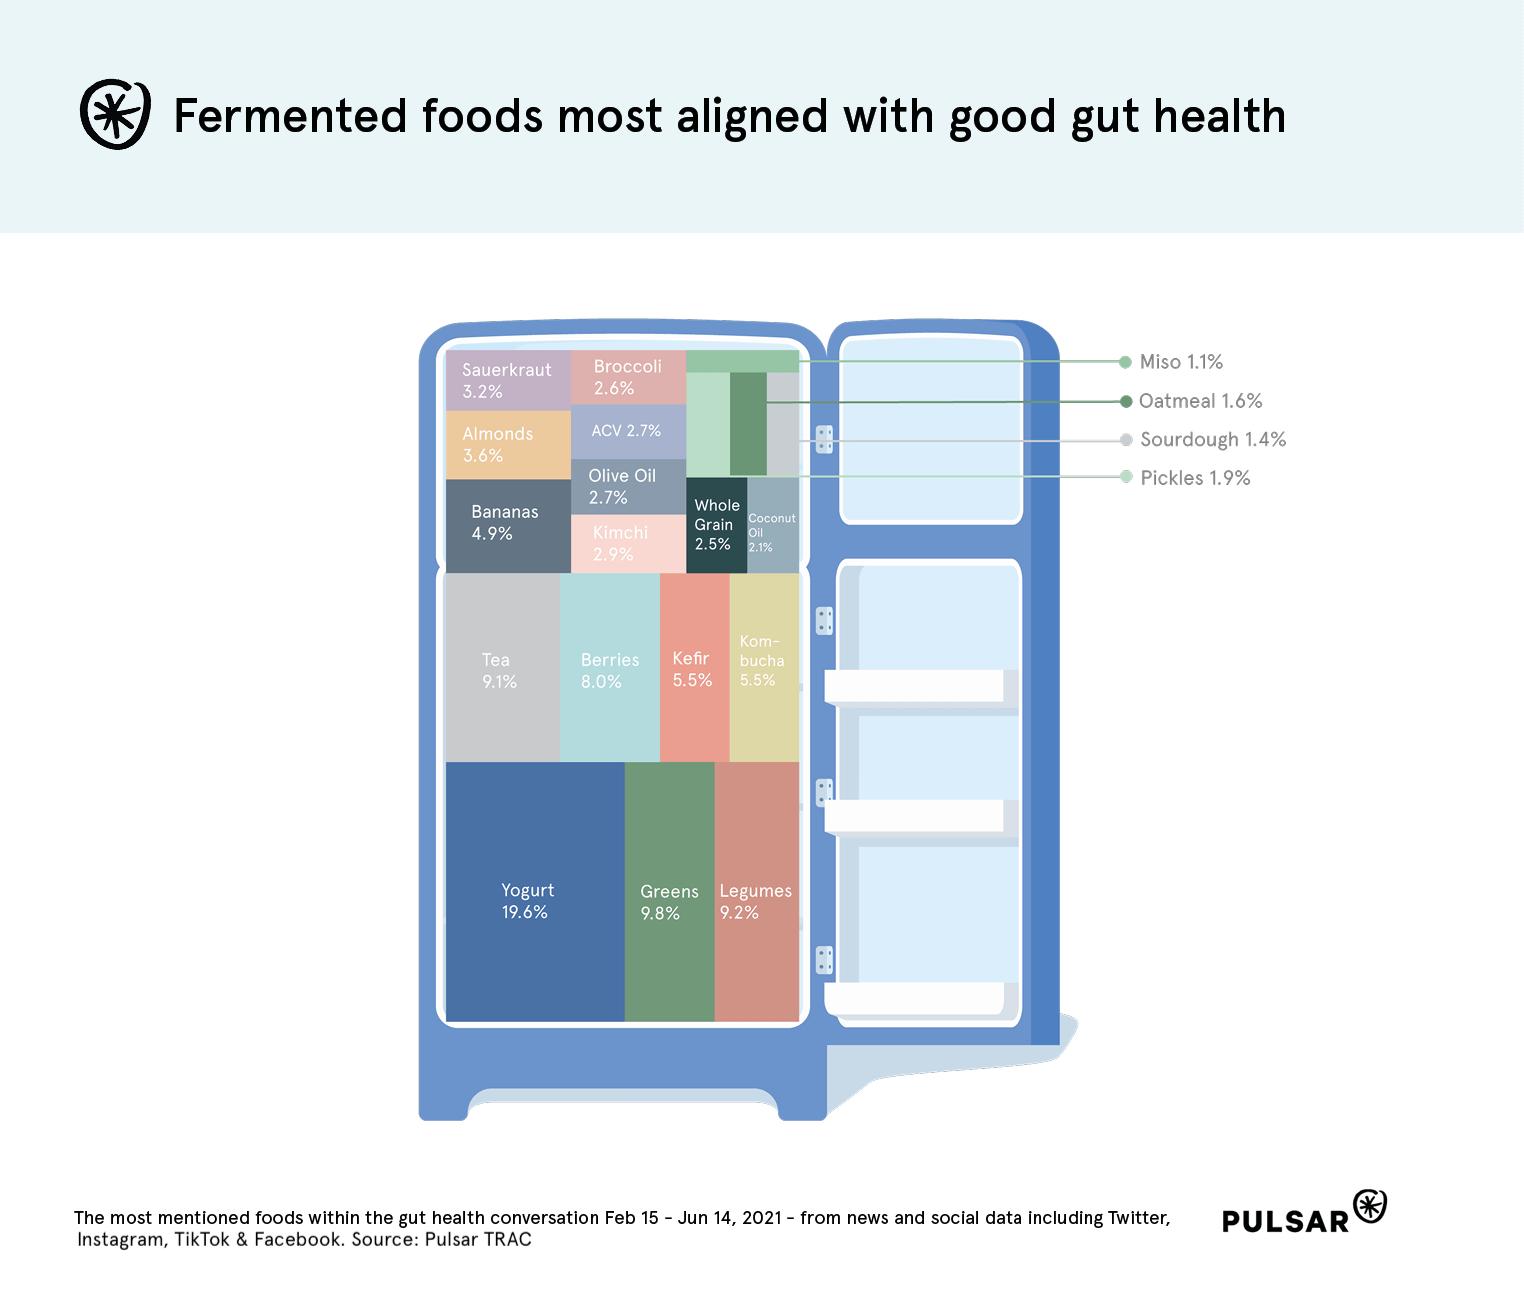 Most popular gut health foods